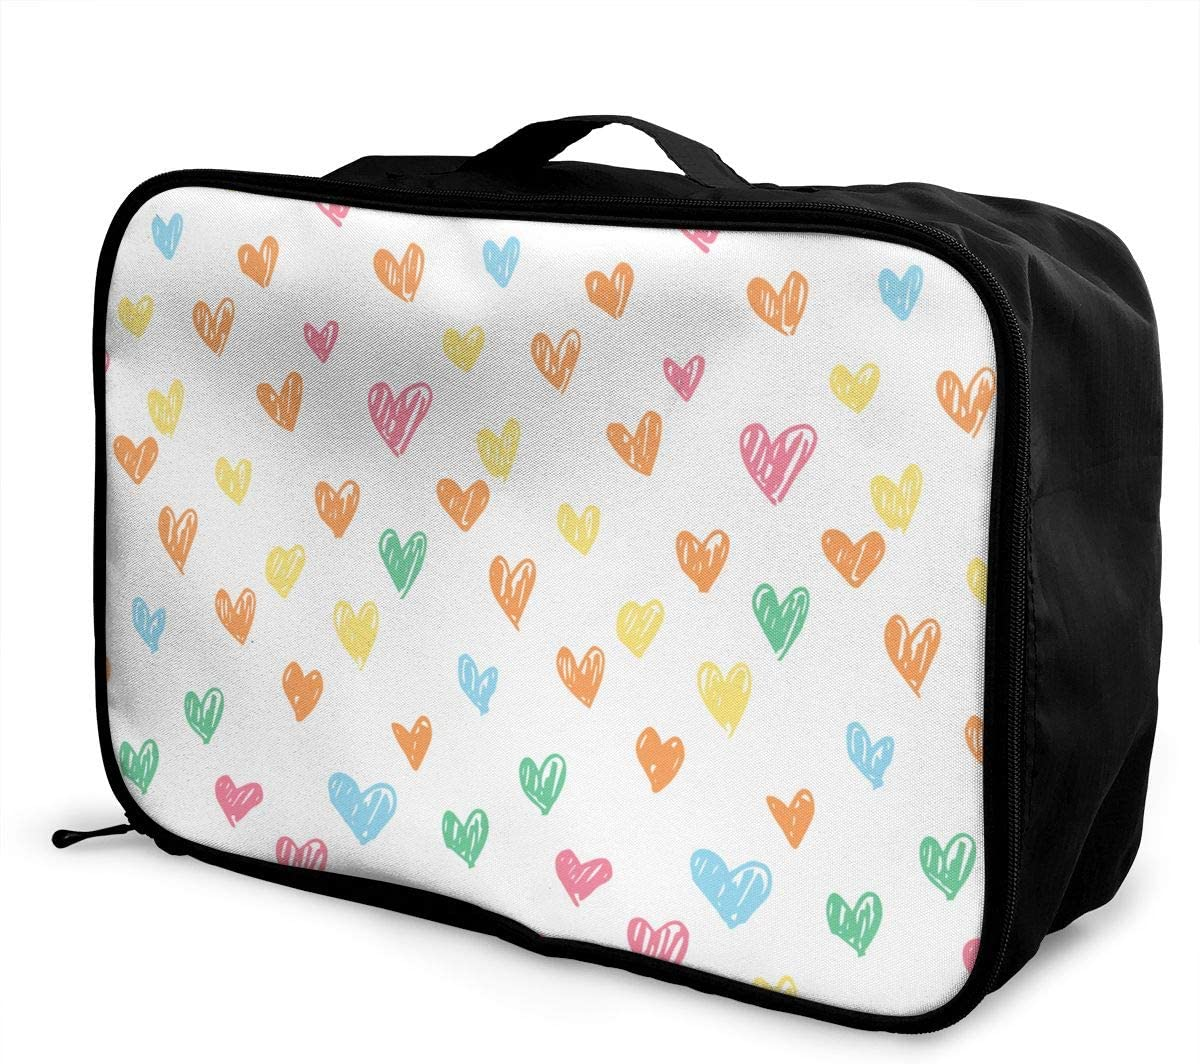 Love Travel Carry-on Luggage Weekender Bag Overnight Tote Flight Duffel In Trolley Handle